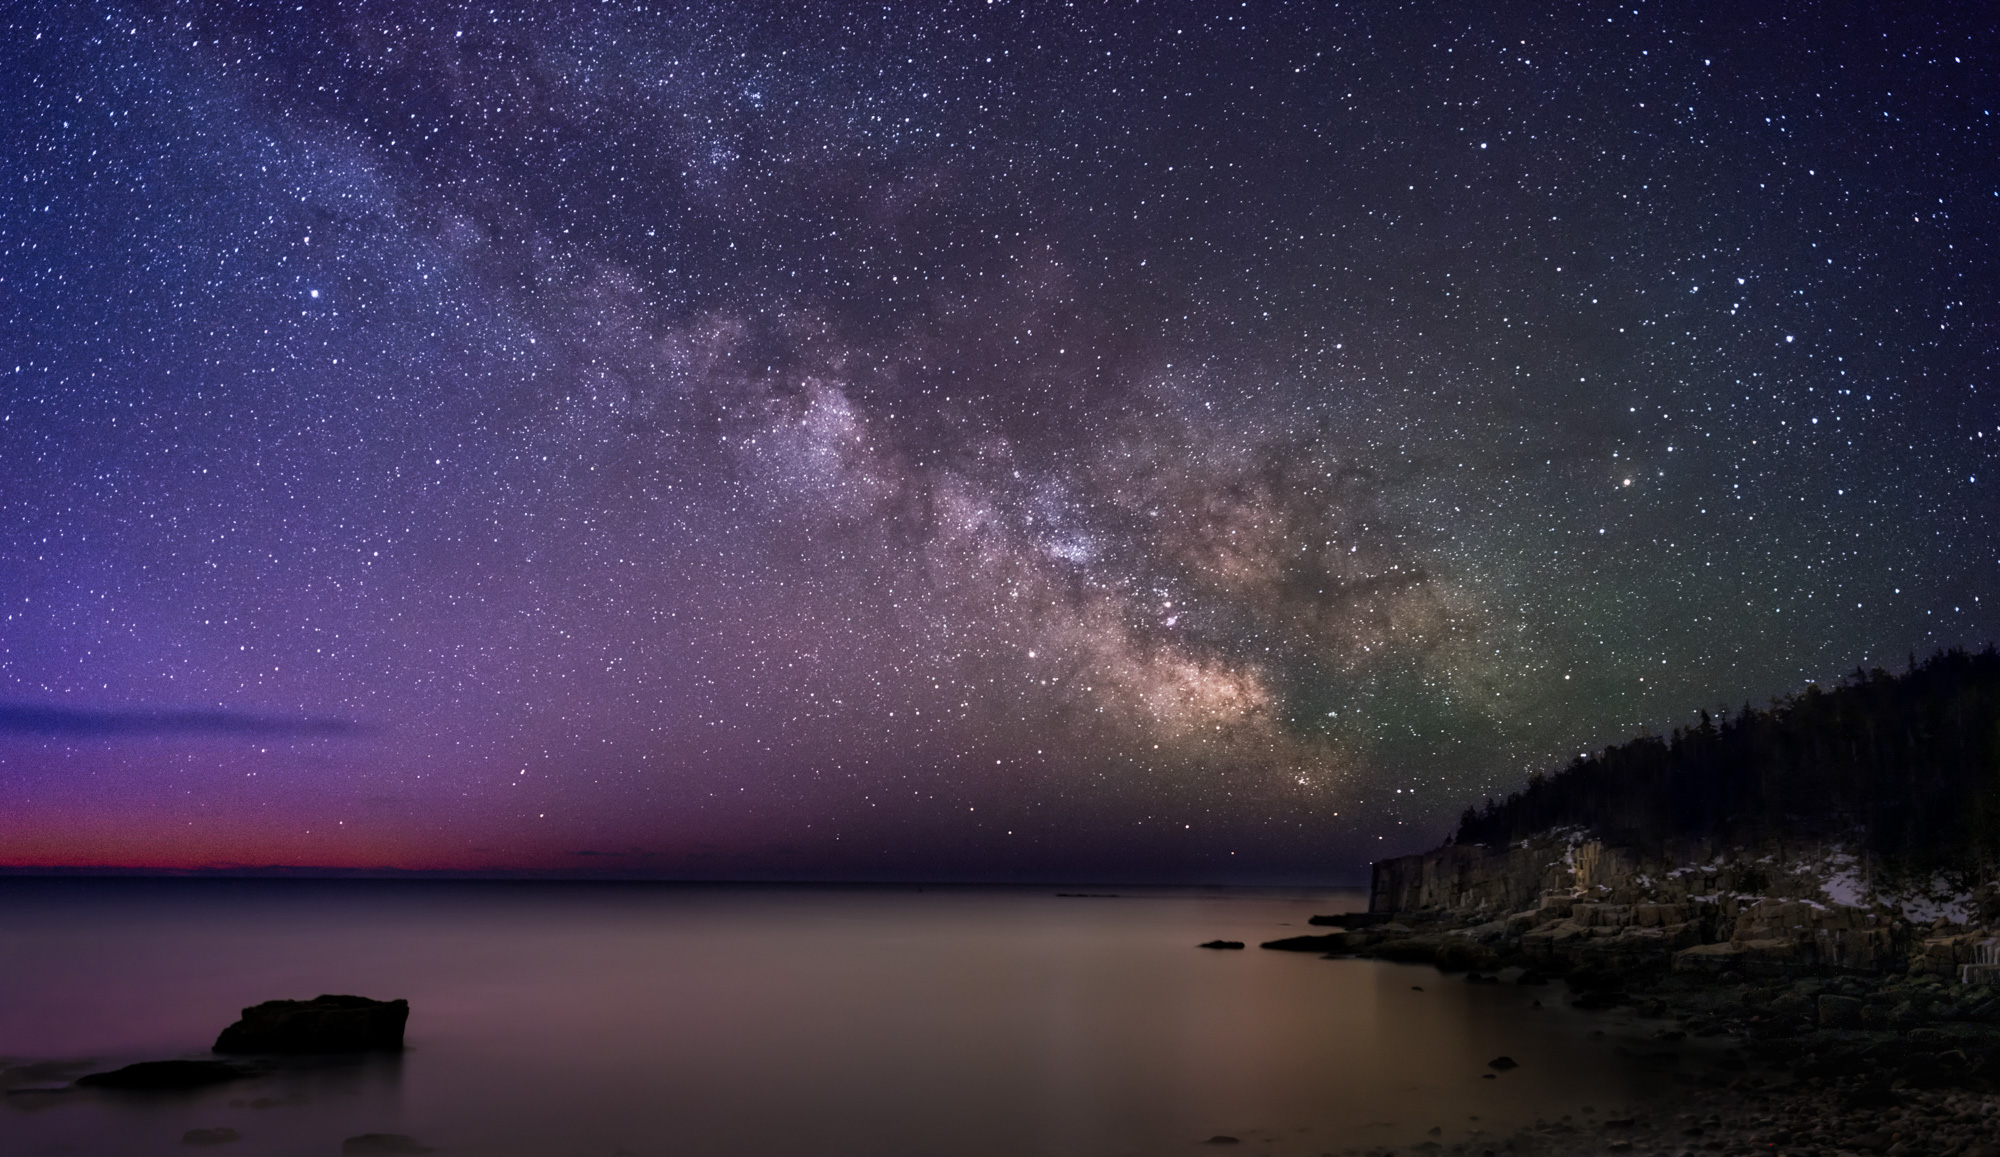 Milky Way, Otter Cliffs, Acadia National Park, Maine